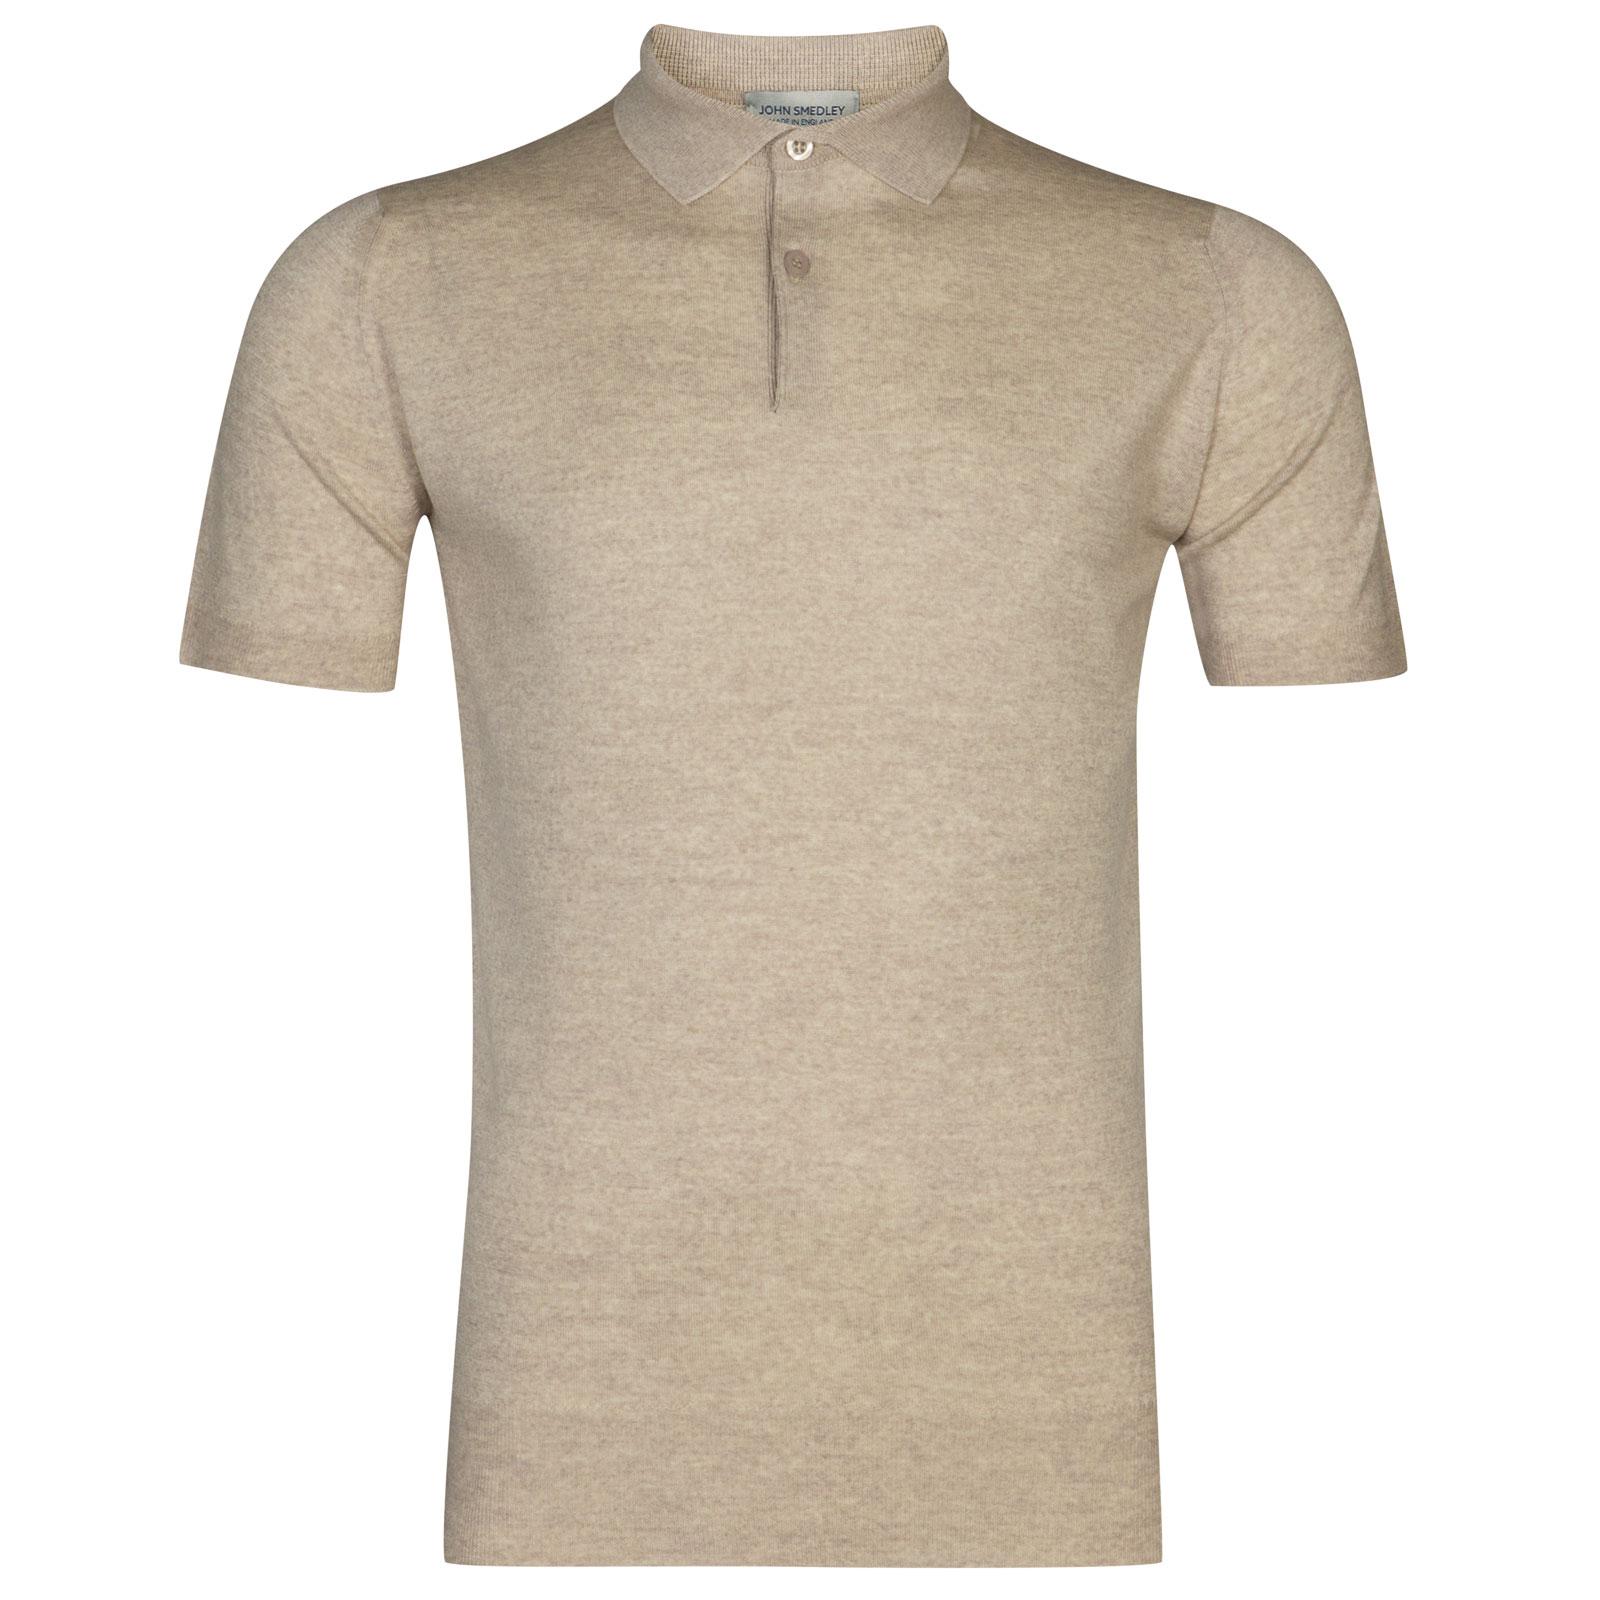 John Smedley payton Merino Wool Shirt in Eastwood Beige-L